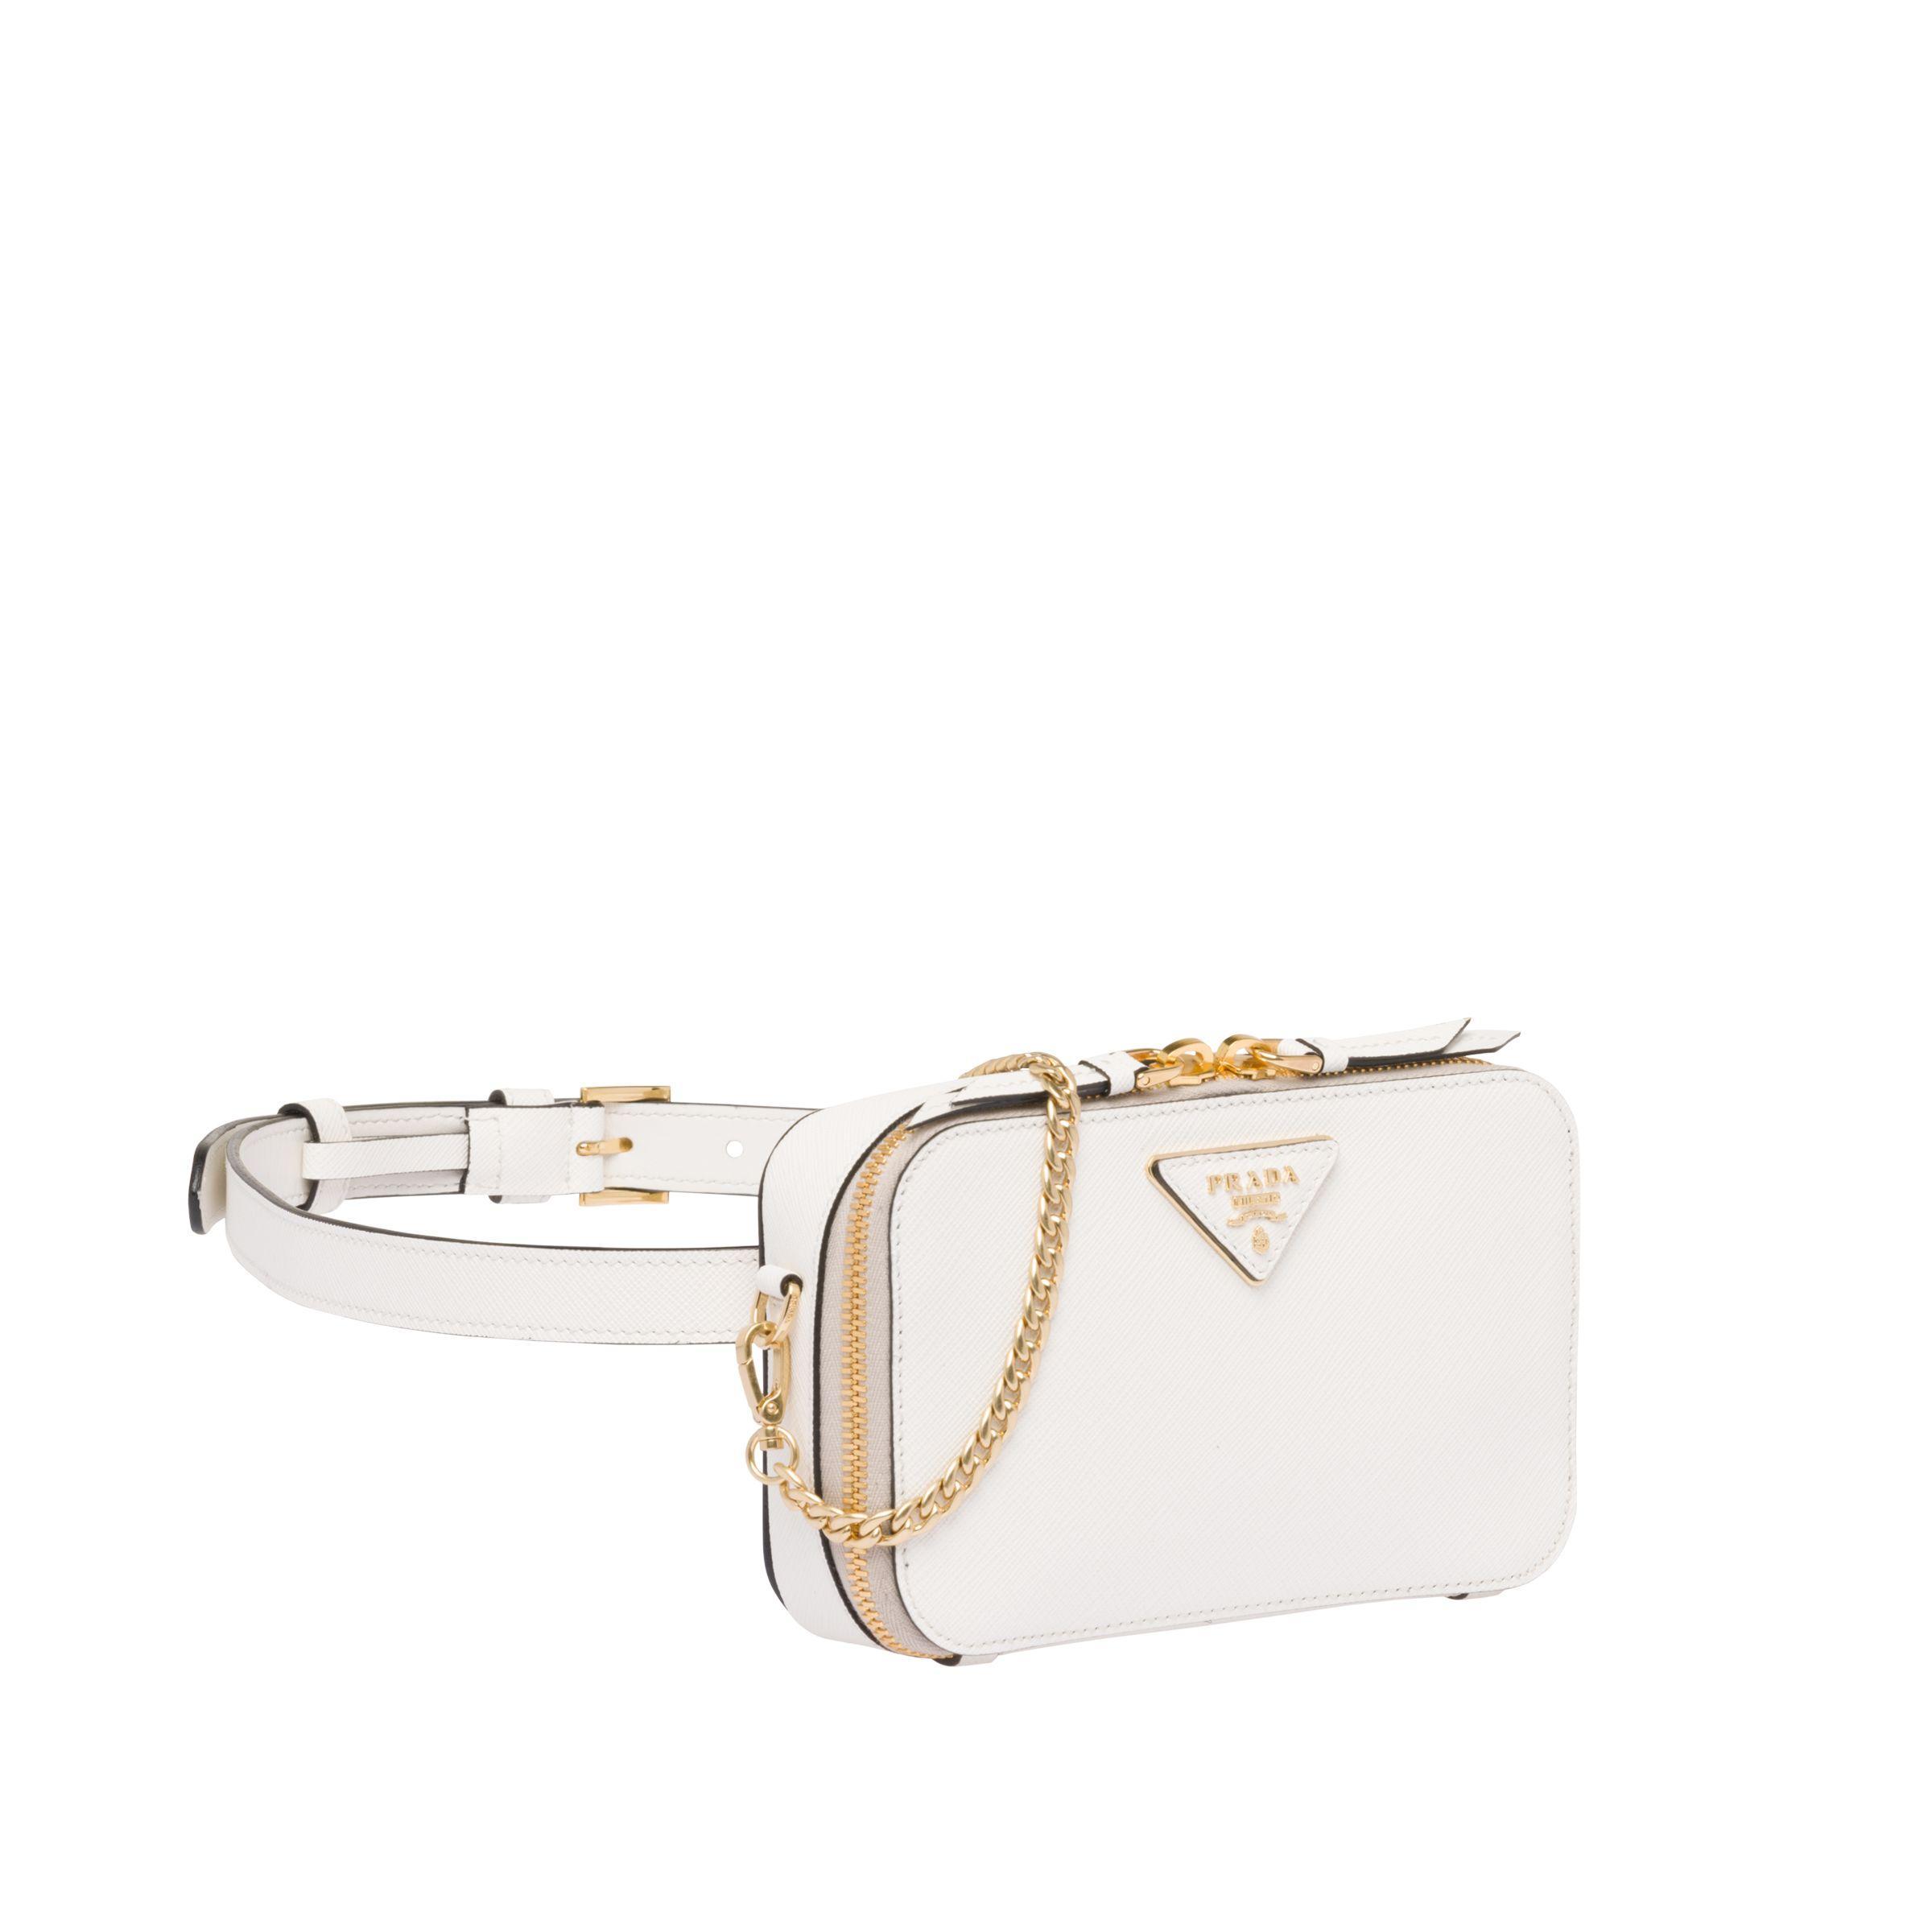 c35be05acb7474 Prada - Multicolor Odette Saffiano Leather Belt Bag - Lyst. View fullscreen